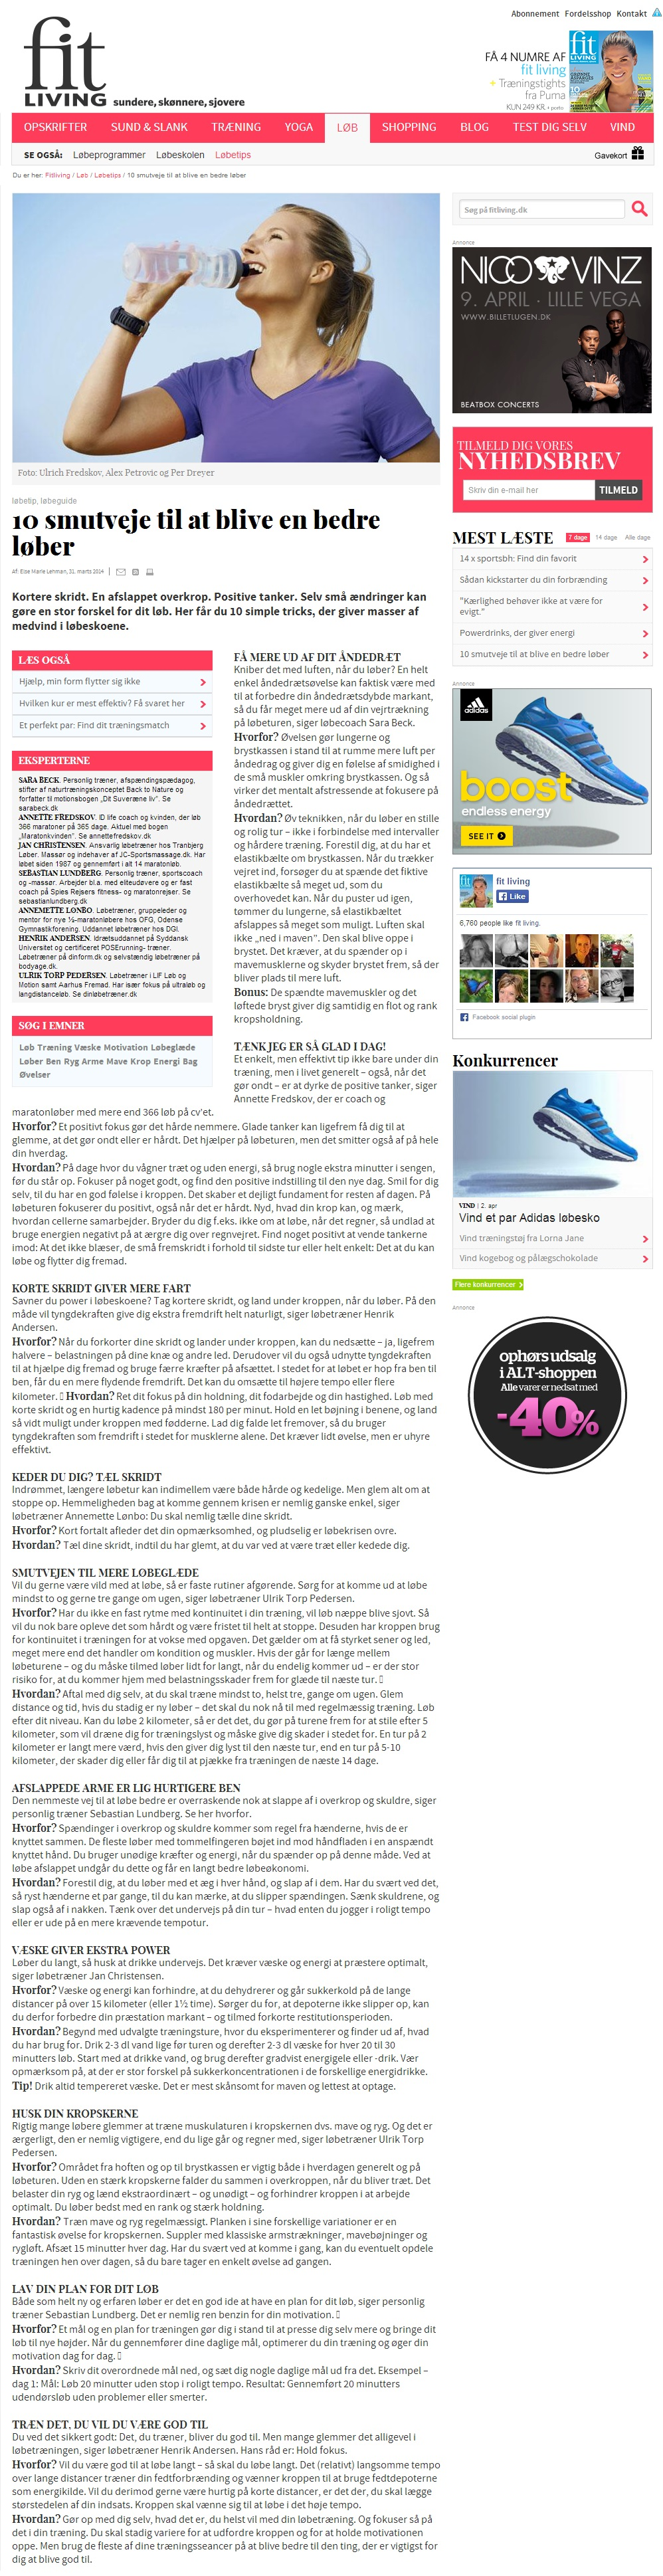 fitliving.dk 2014.03.31